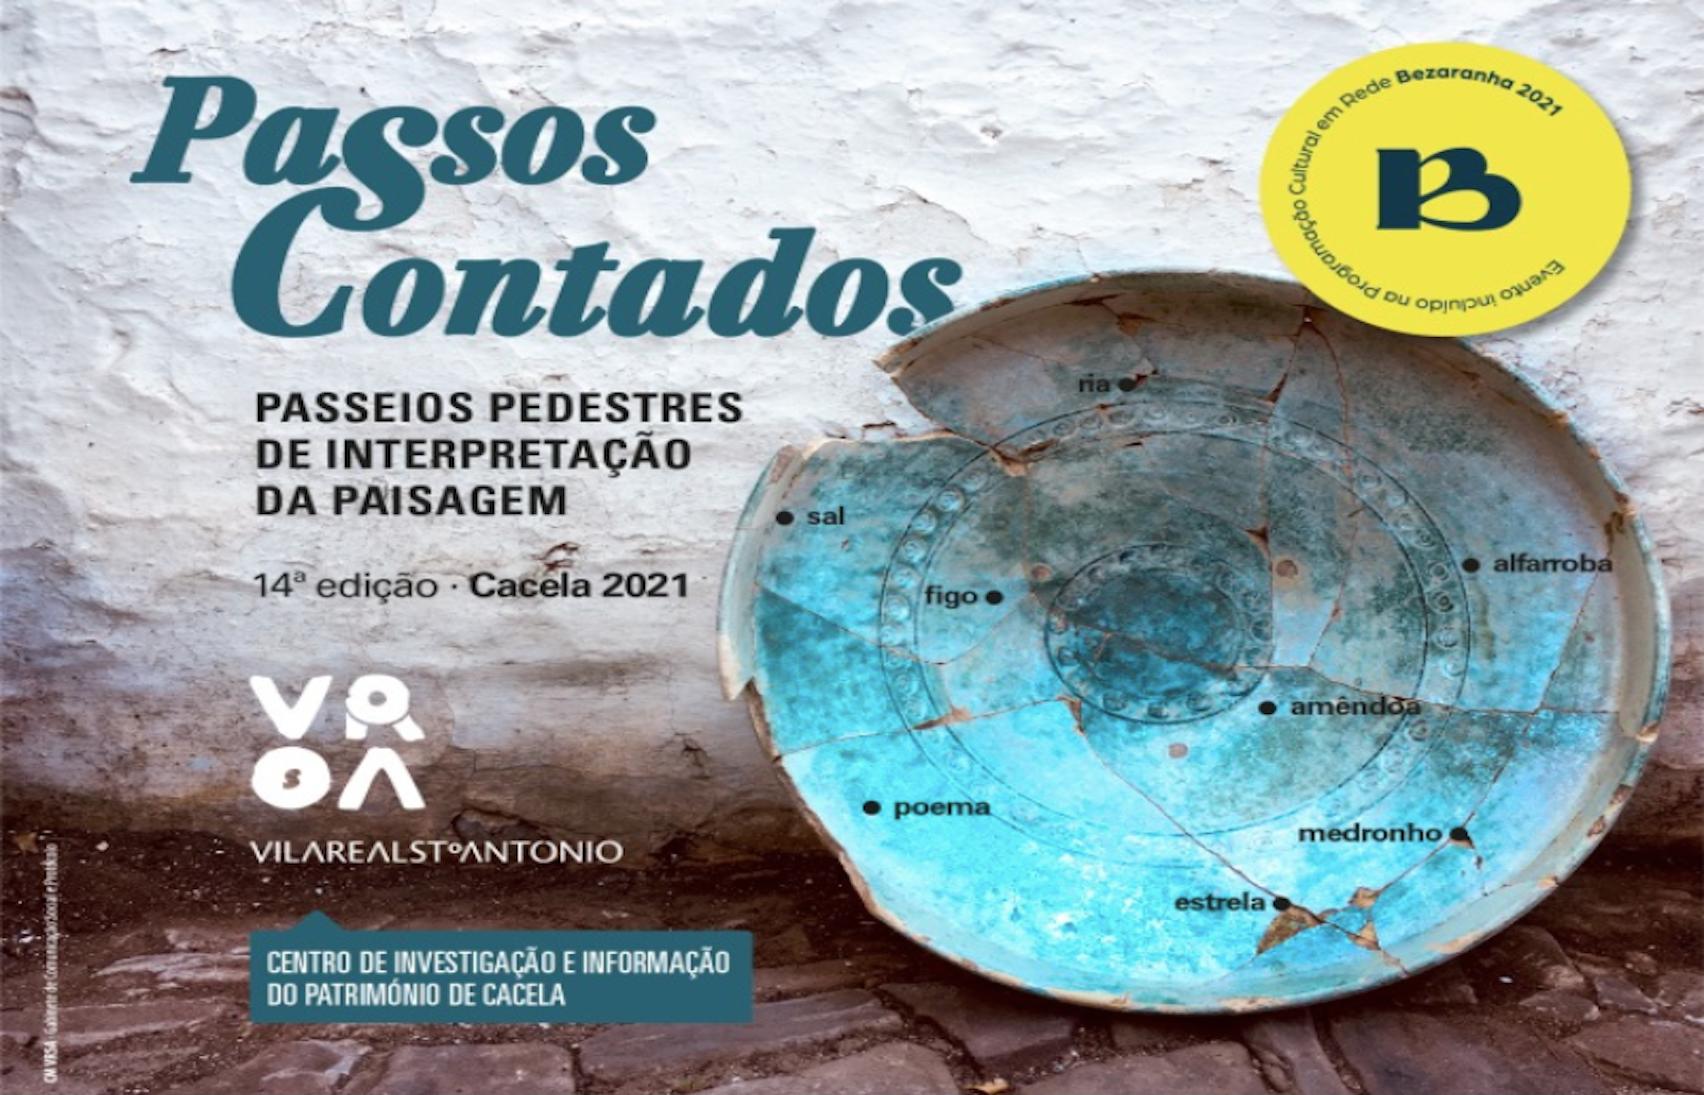 Passos Contados -  O pomar tradicional de sequeiro (o figo, a amêndoa e a alfarroba) no Barrocal Algarvio